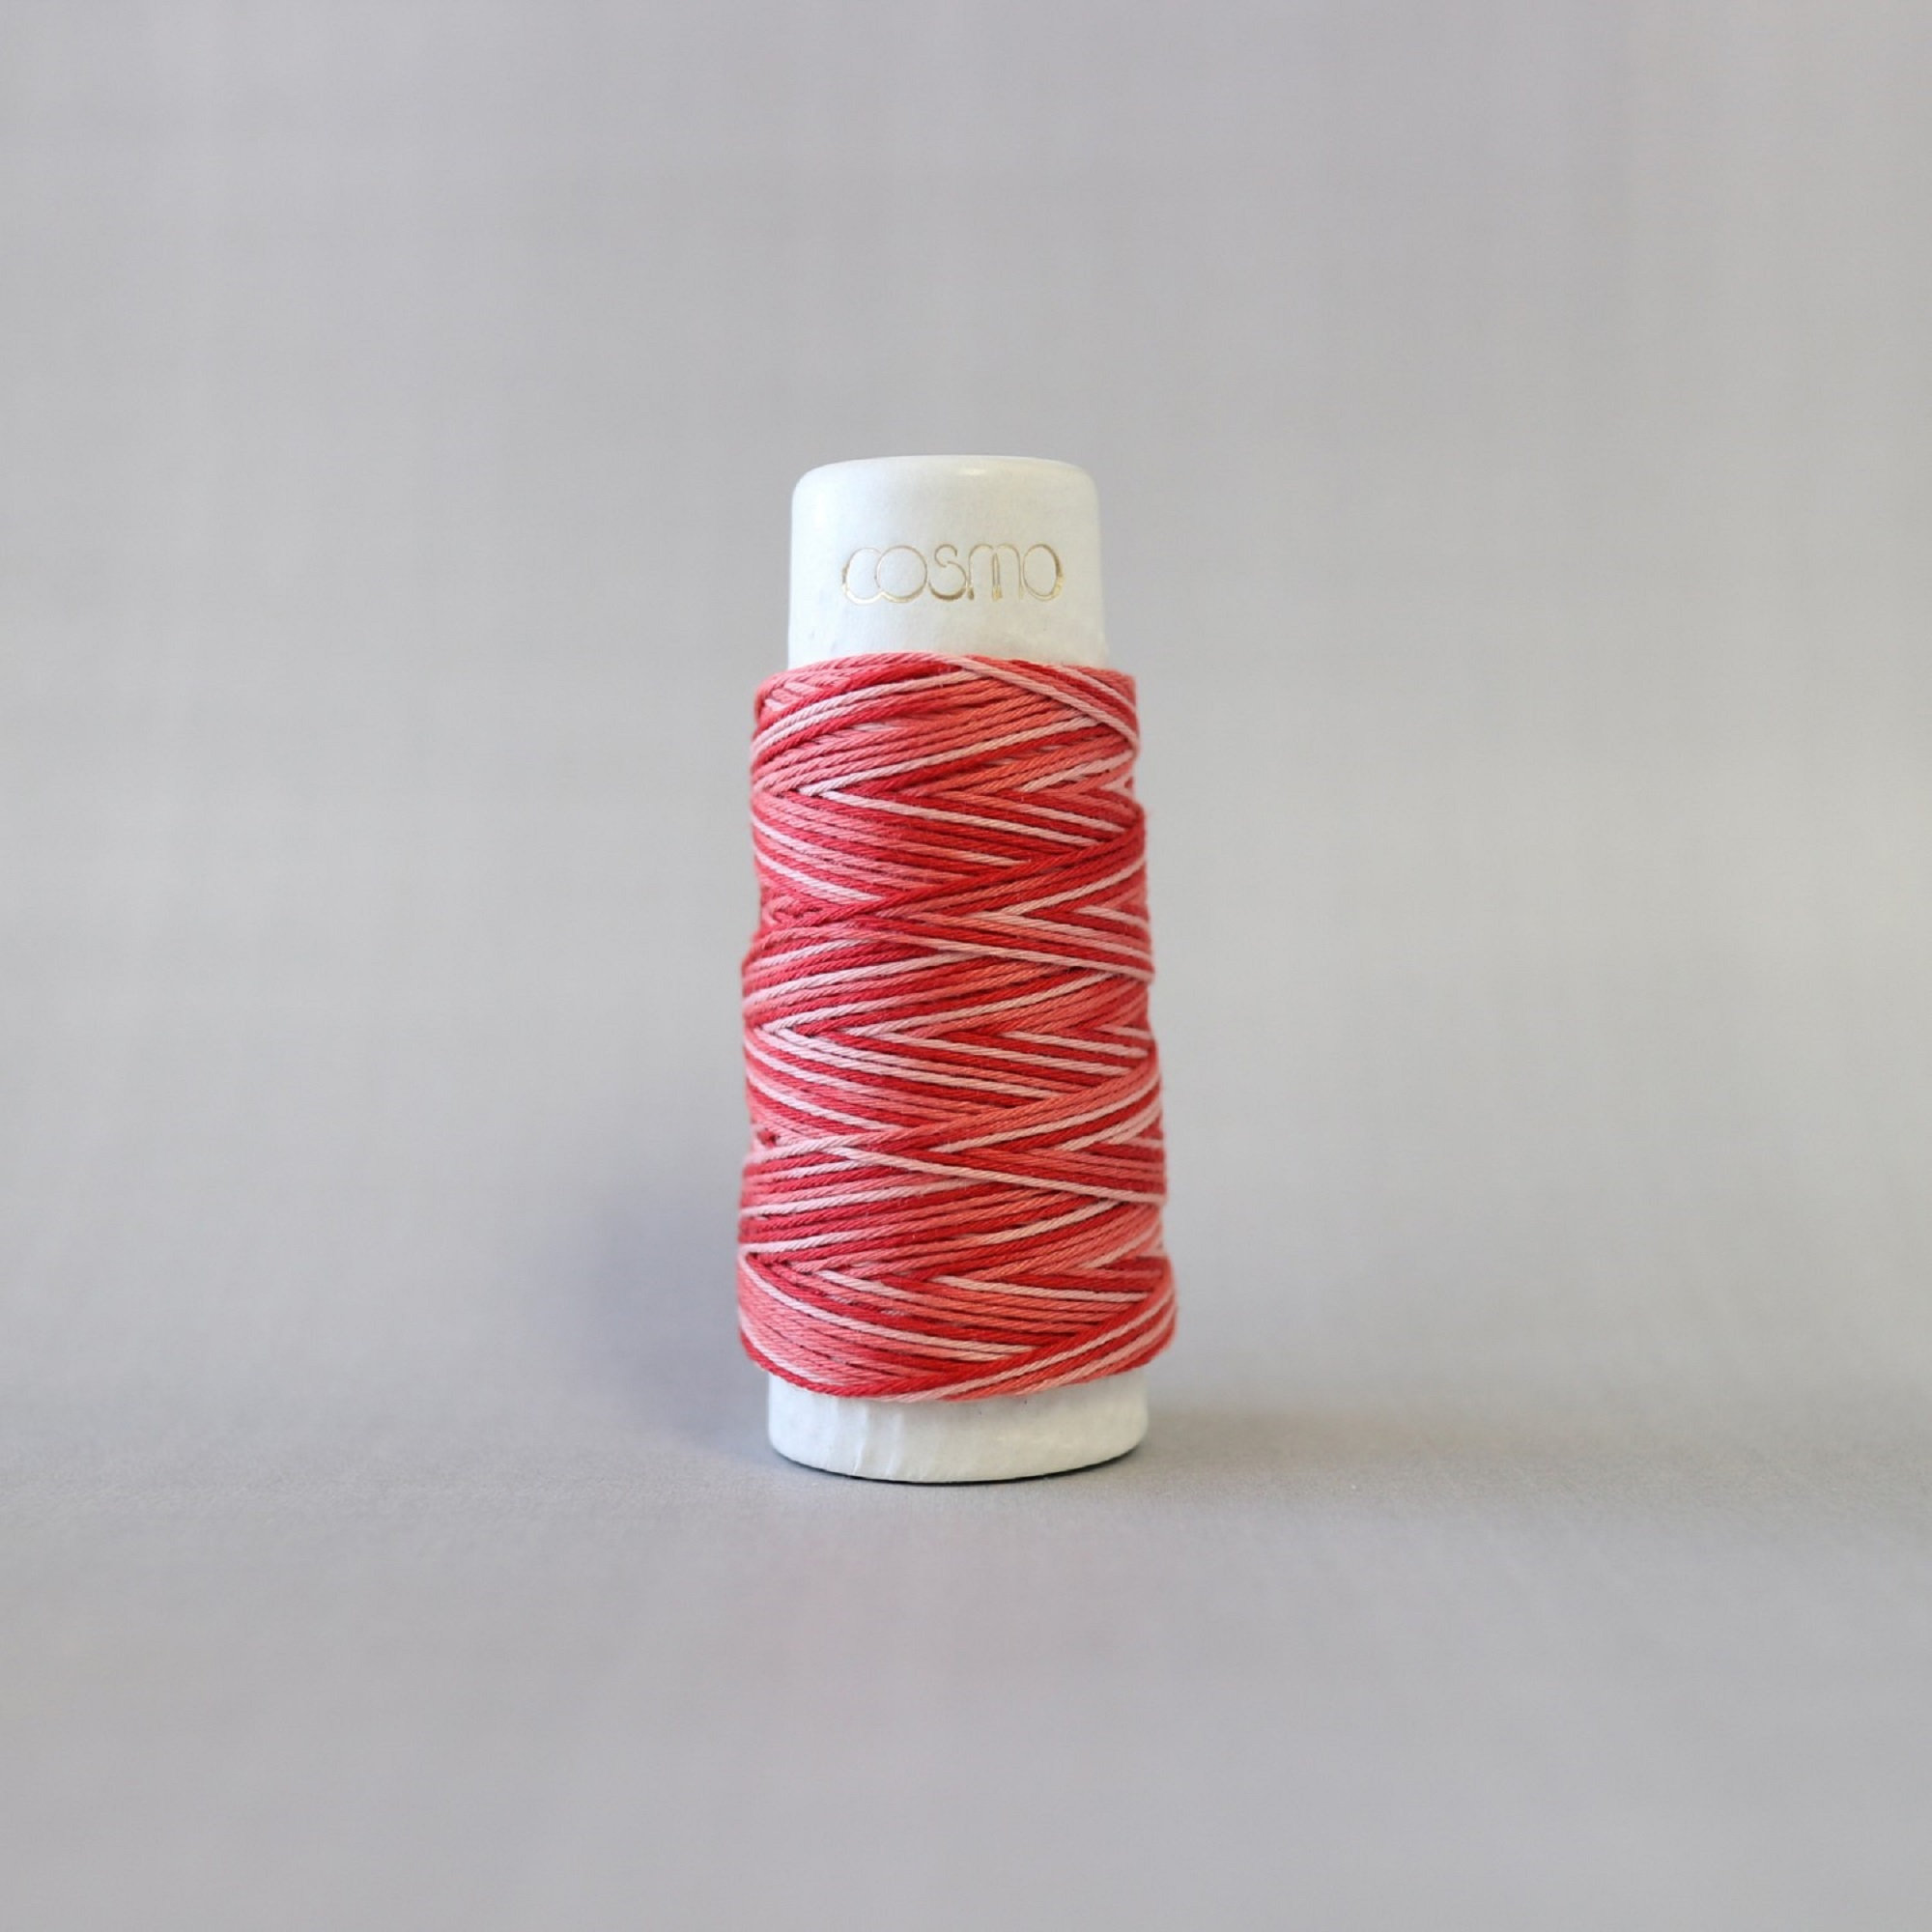 Lecien COSMO hidamari & Sashiko Variegated Cotton Thread - 30m - No. 89-402 Rose Banquet